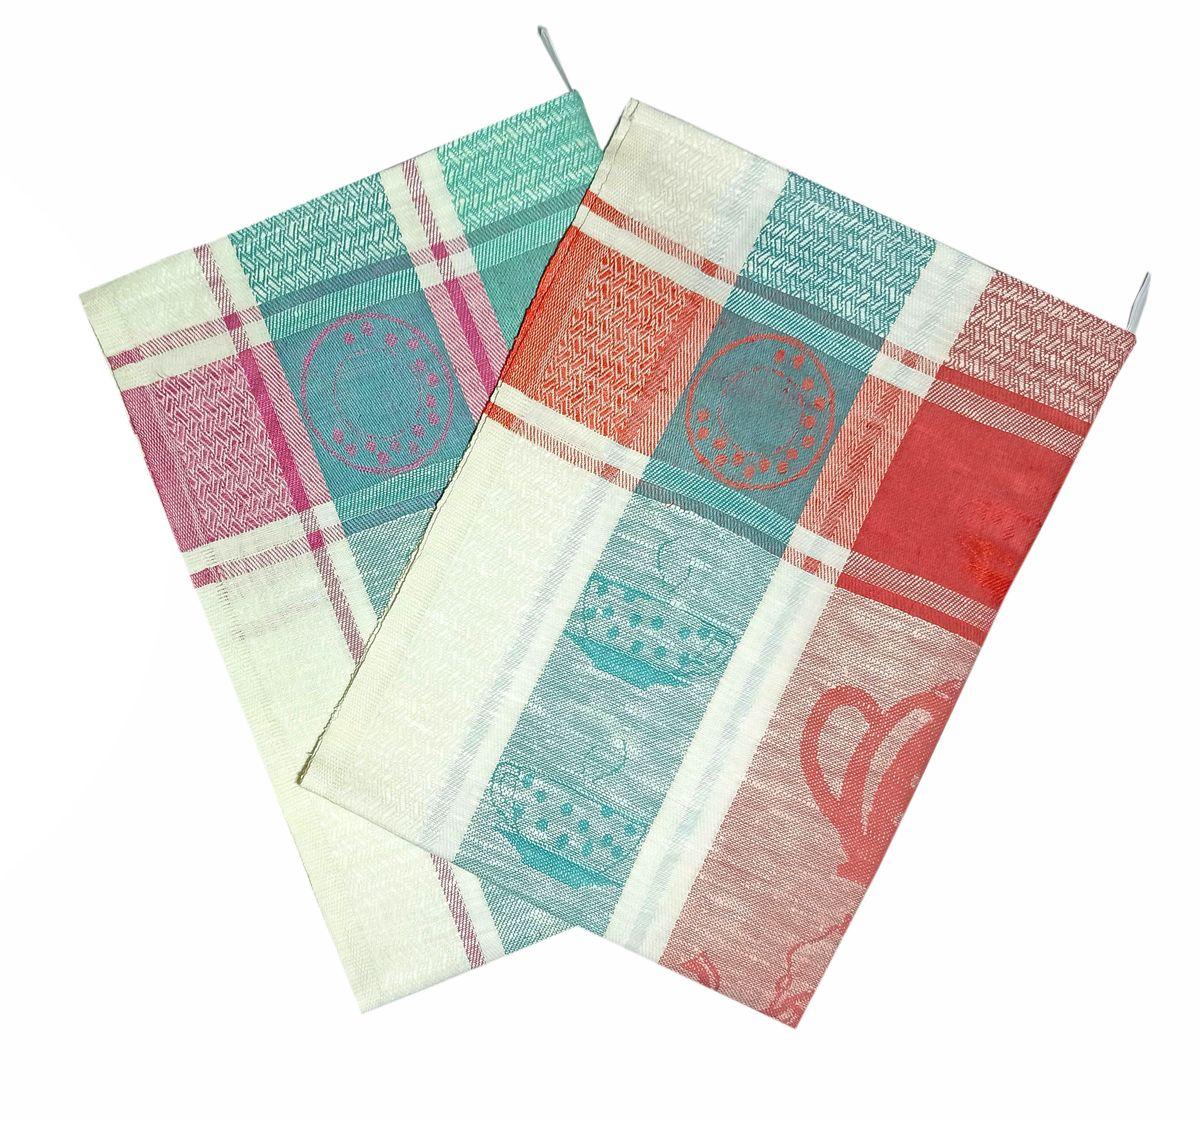 Комплект полотенец 50*70 см, 2 шт., 100% лён (Чашки)